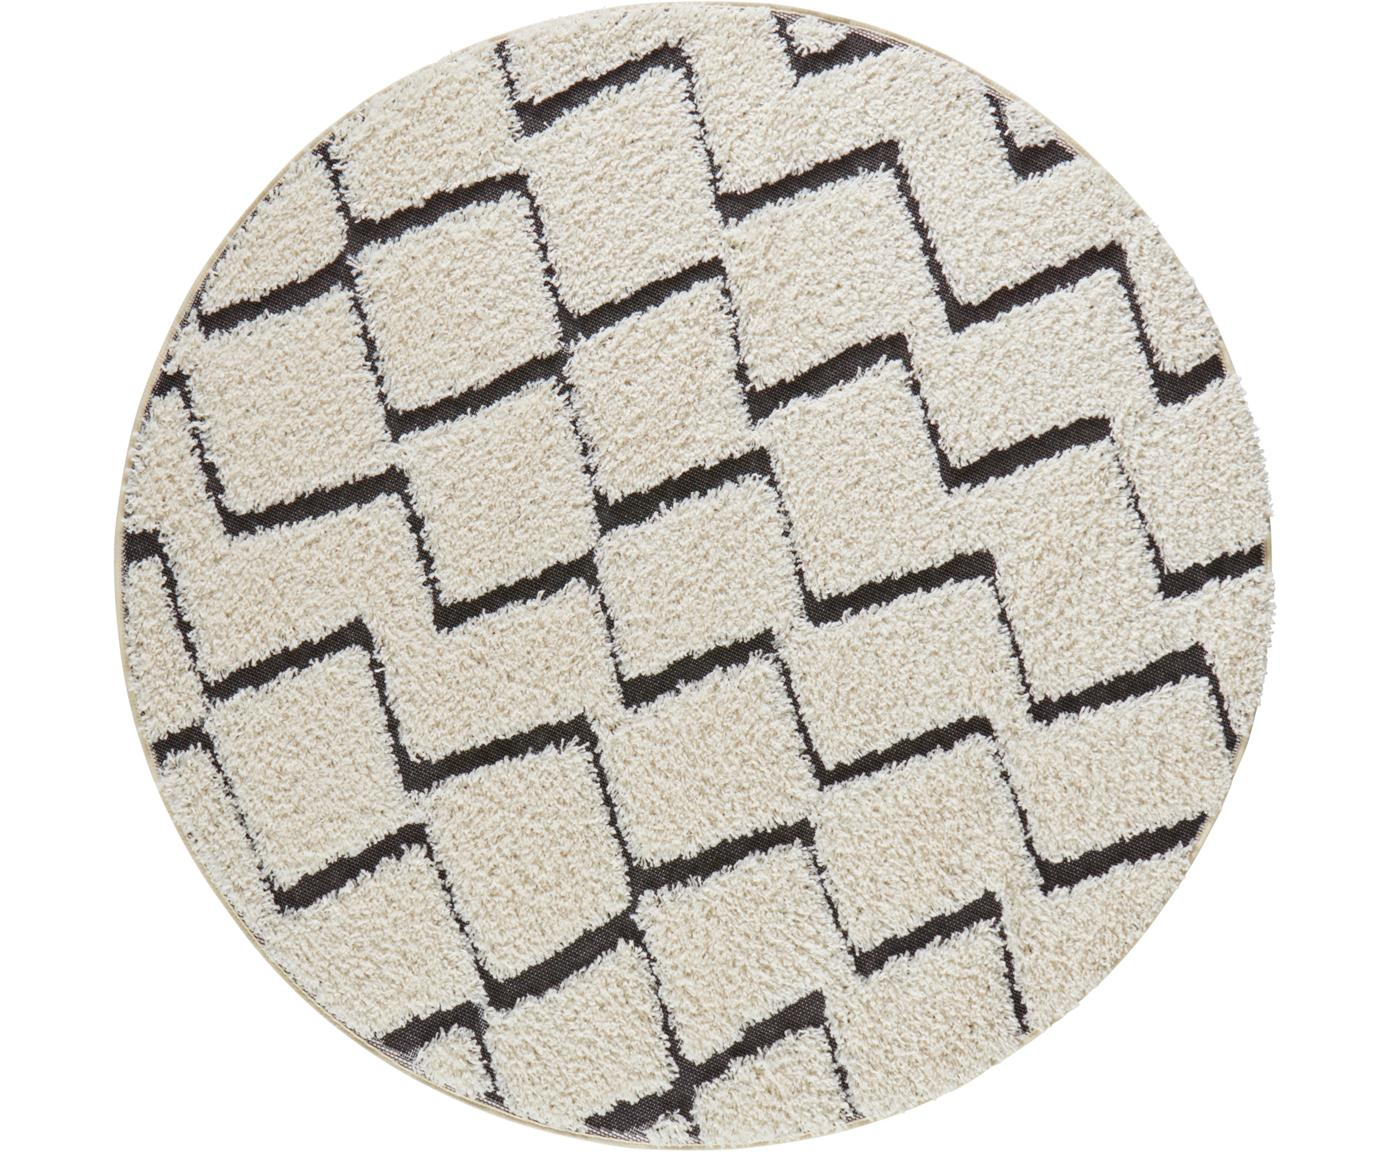 Alfombra redonda texturizada de interior/exterior Dades, Crema, negro, Ø 160 cm (Tamaño L)